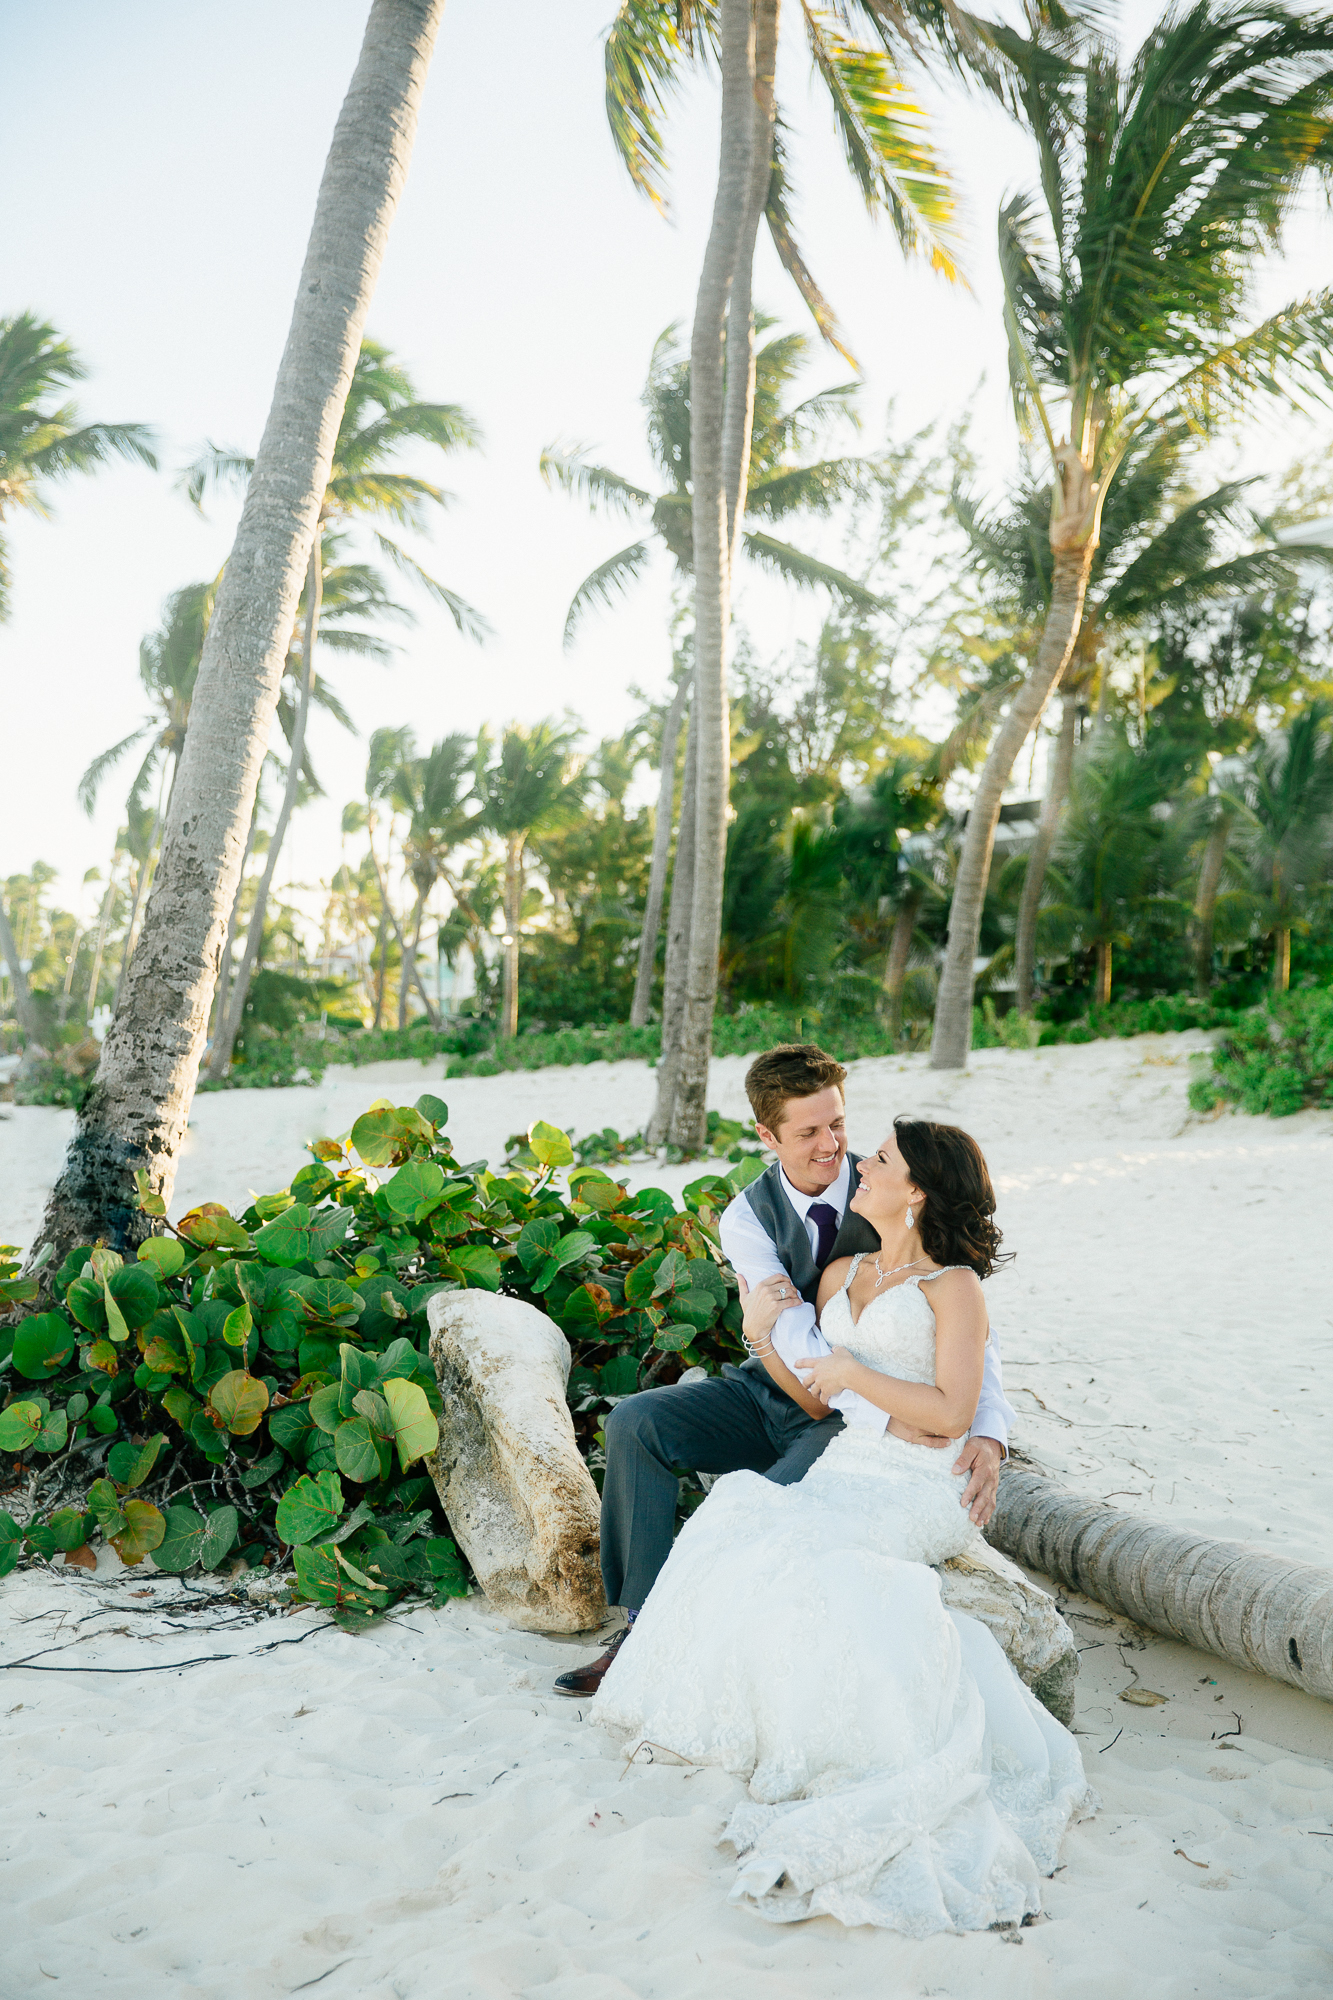 Jen_Montgomery_Photography_ZT_Dominican_Wedding-169.jpg